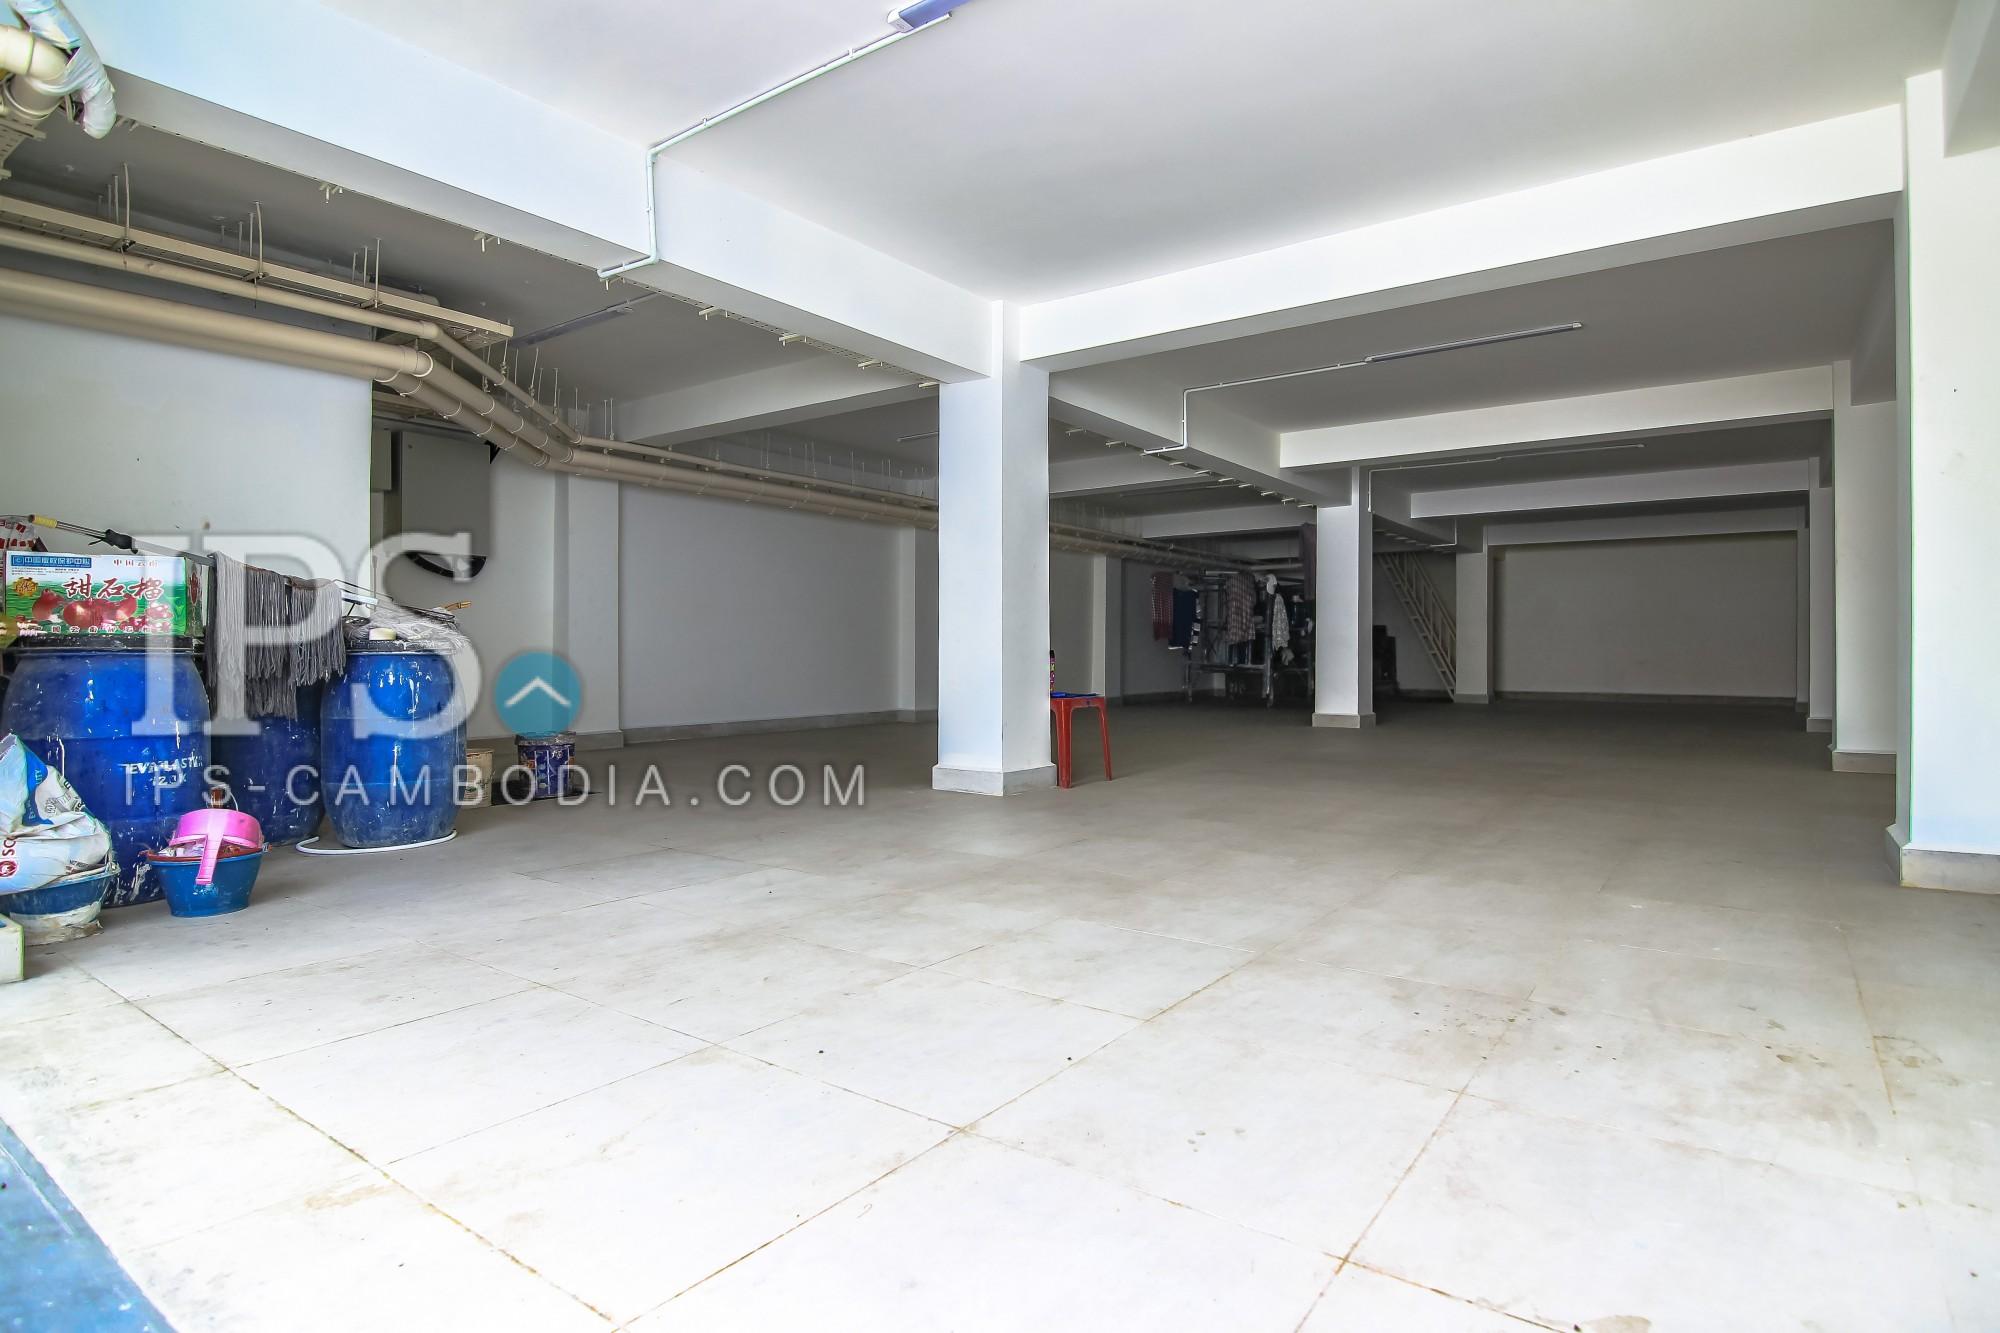 7 Floors Commercial Building For Rent - Chbar Ampov, Phnom Penh